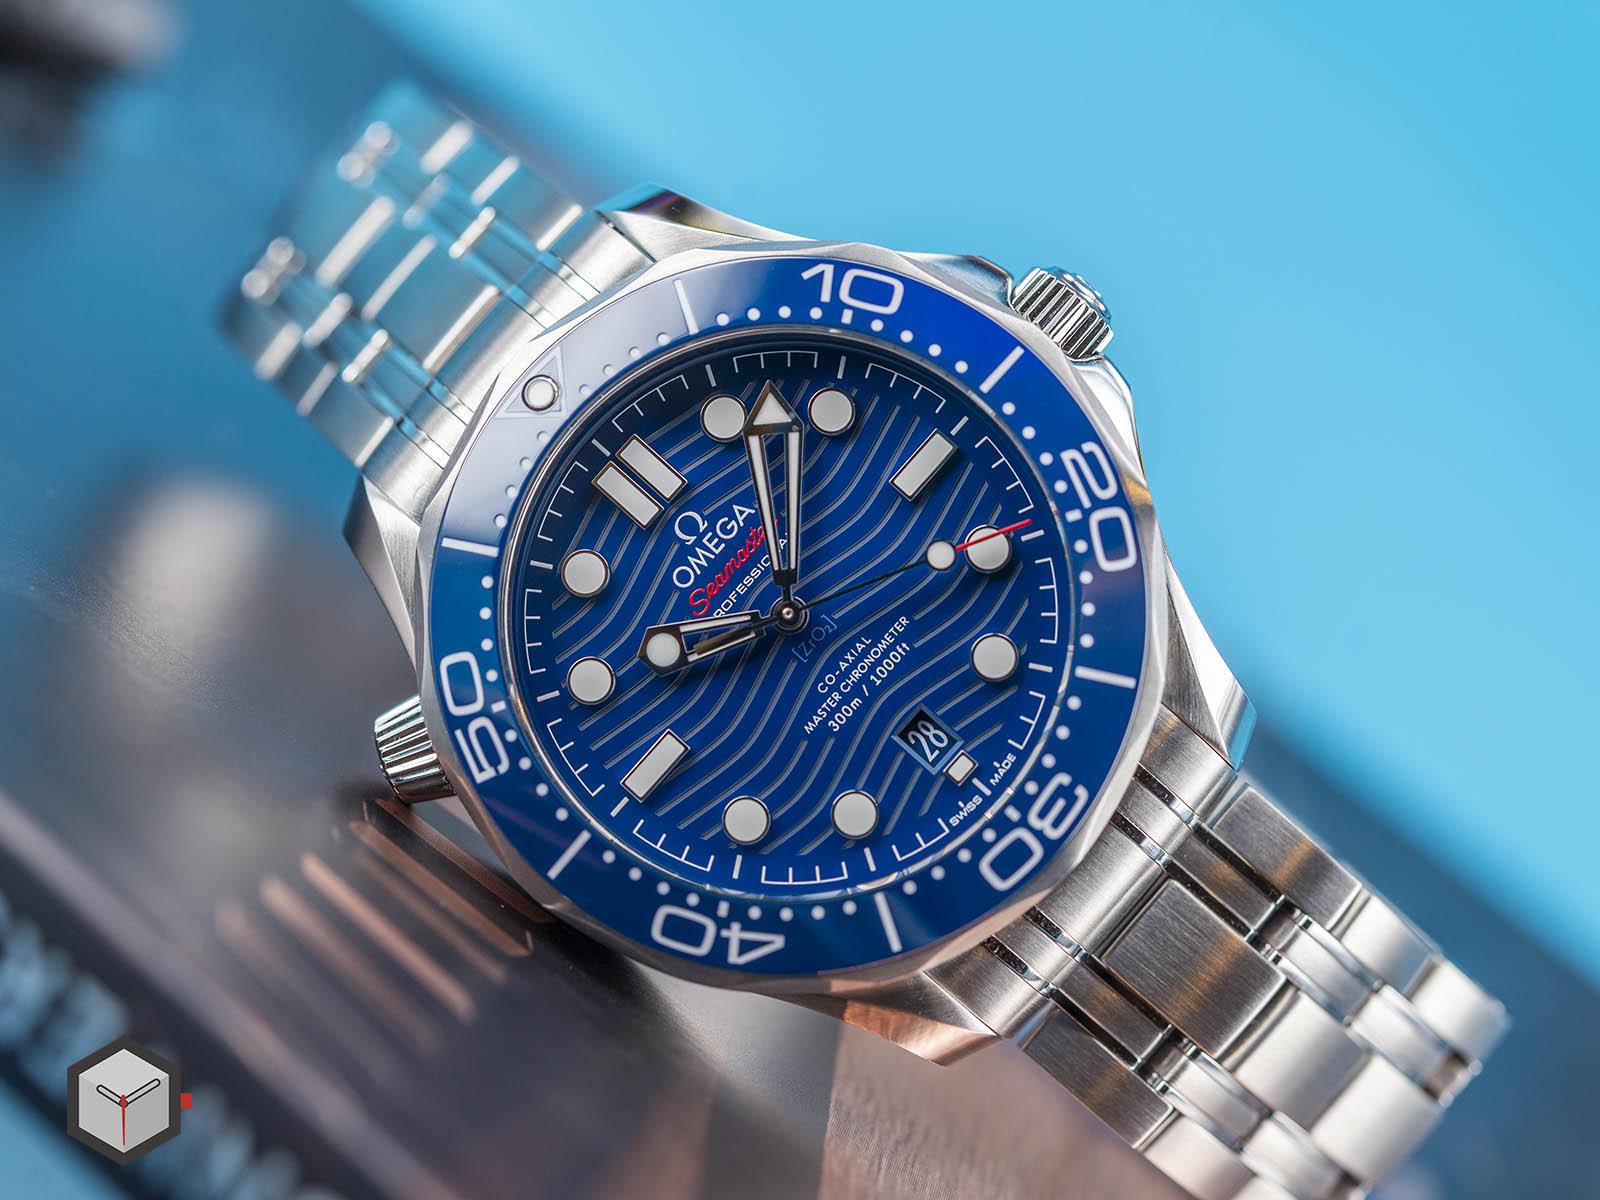 210-30-42-20-03-001-omega-seamaster-professional-diver-300m-3.jpg